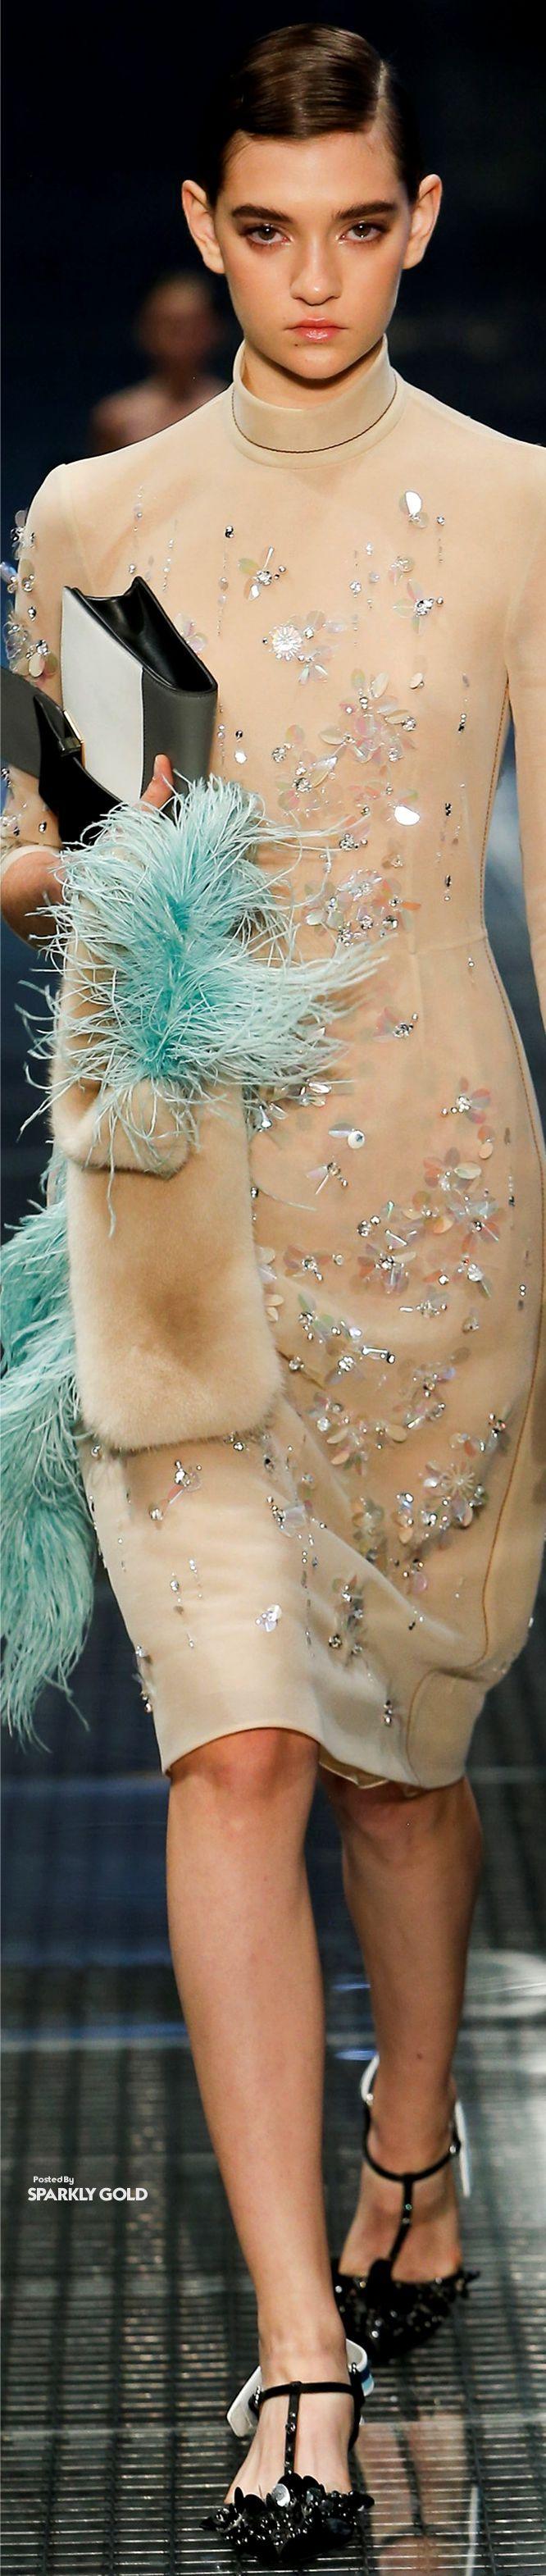 Miuccia Prada 2017  Miuccia Prada is an Italian fashion designer and businesswoman. She is the head designer of Prada and the founder of its subsidiary Miu Miu.